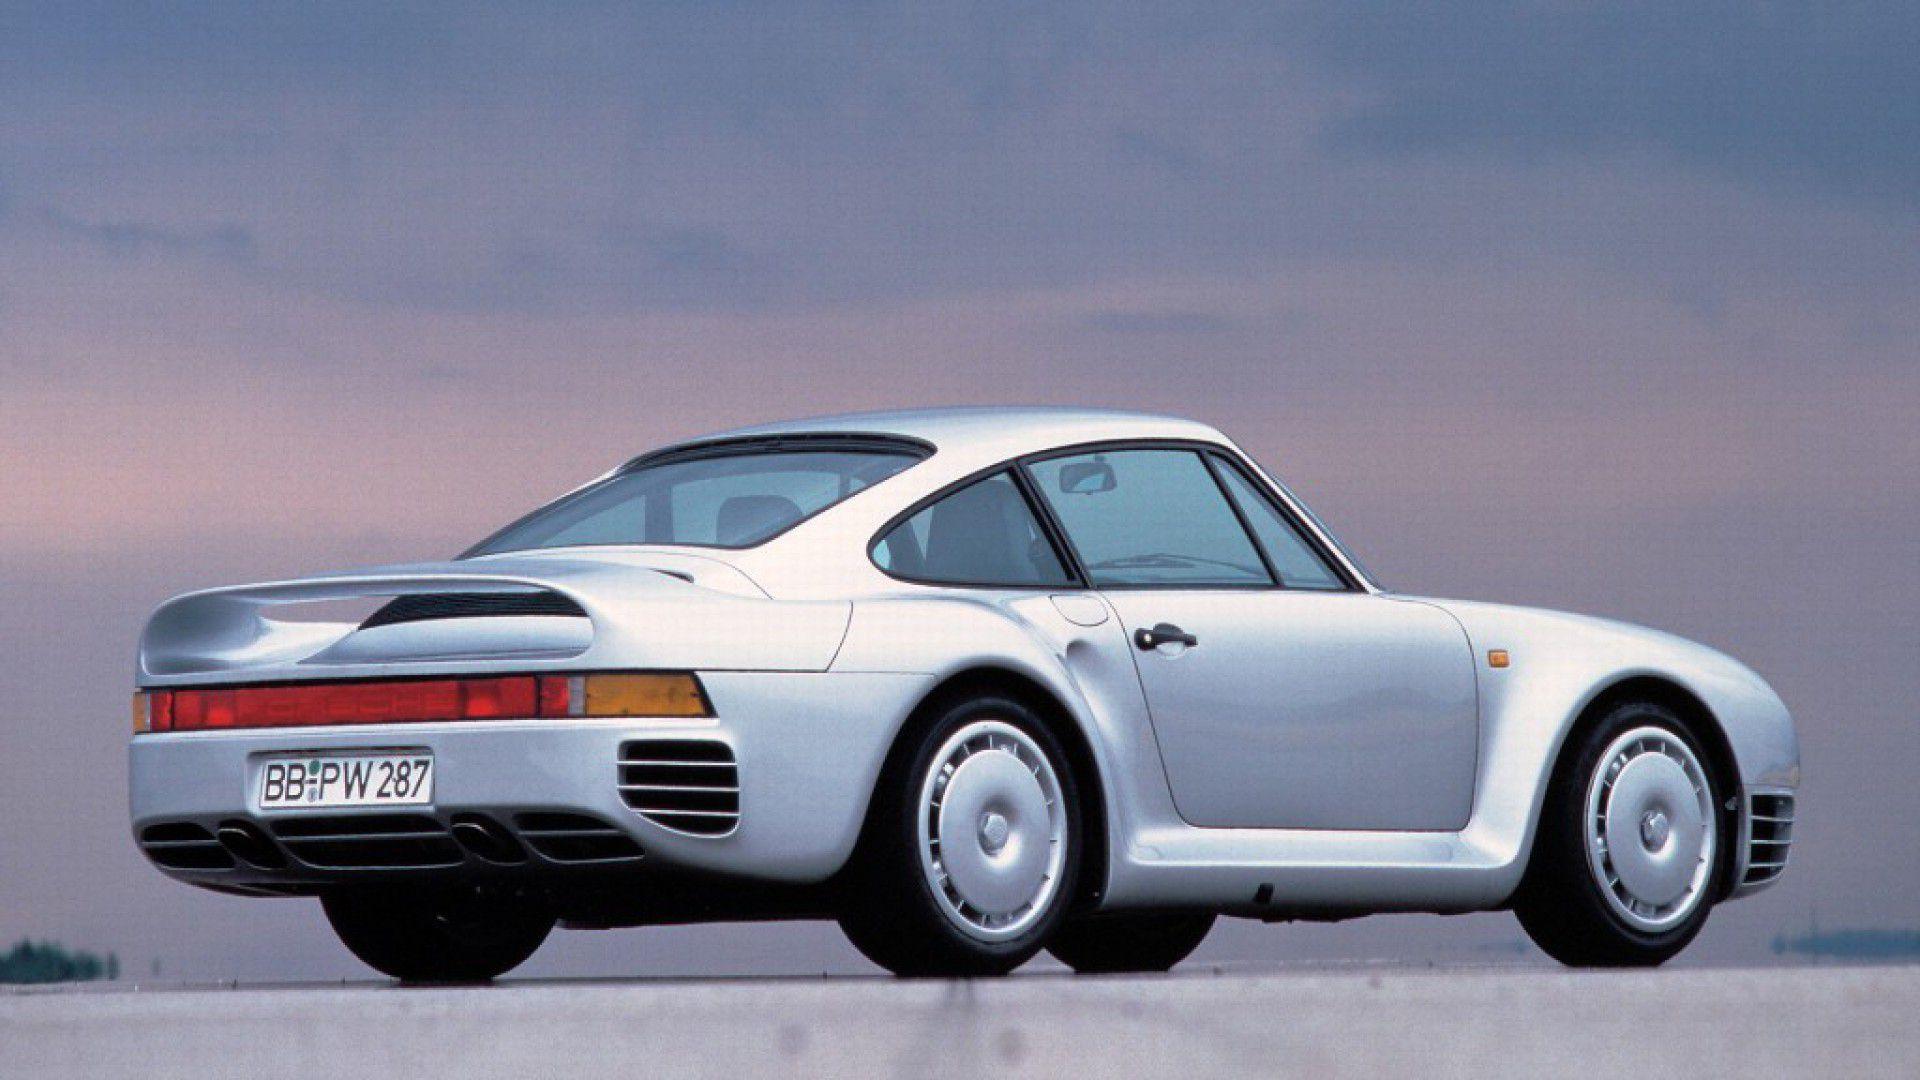 Dodge List Of Cars >> Porsche 969 » Definitive List - Cars